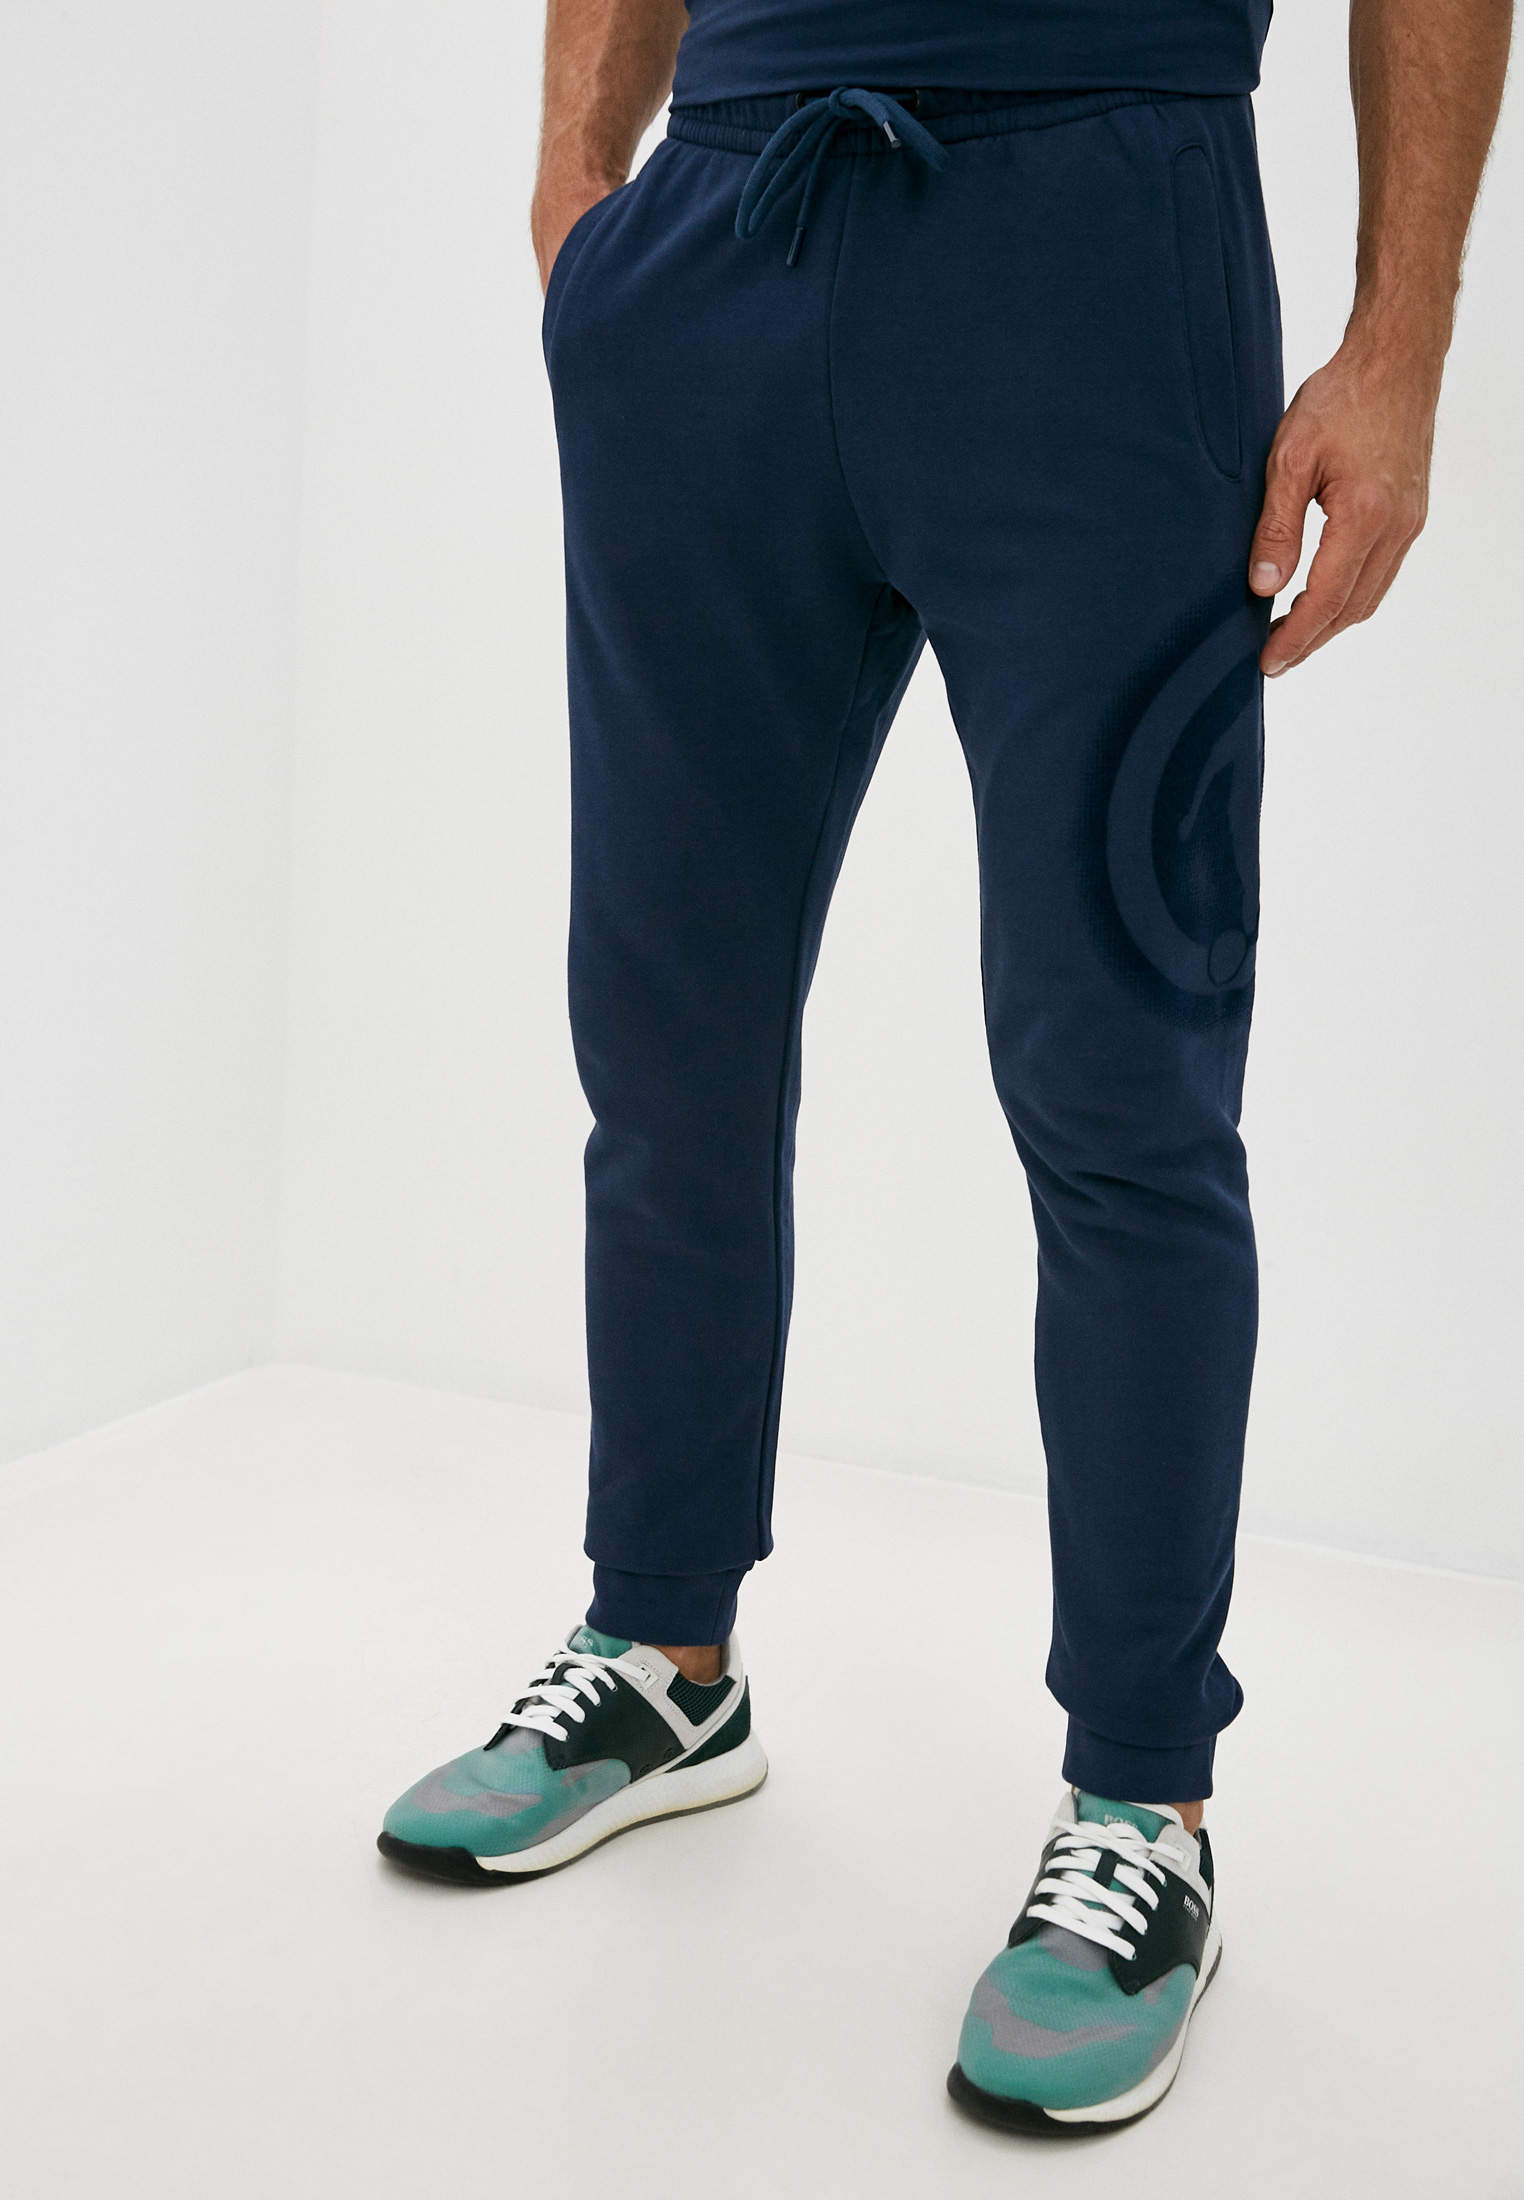 Мужские спортивные брюки Bikkembergs (Биккембергс) C 1 159 1T M 4121